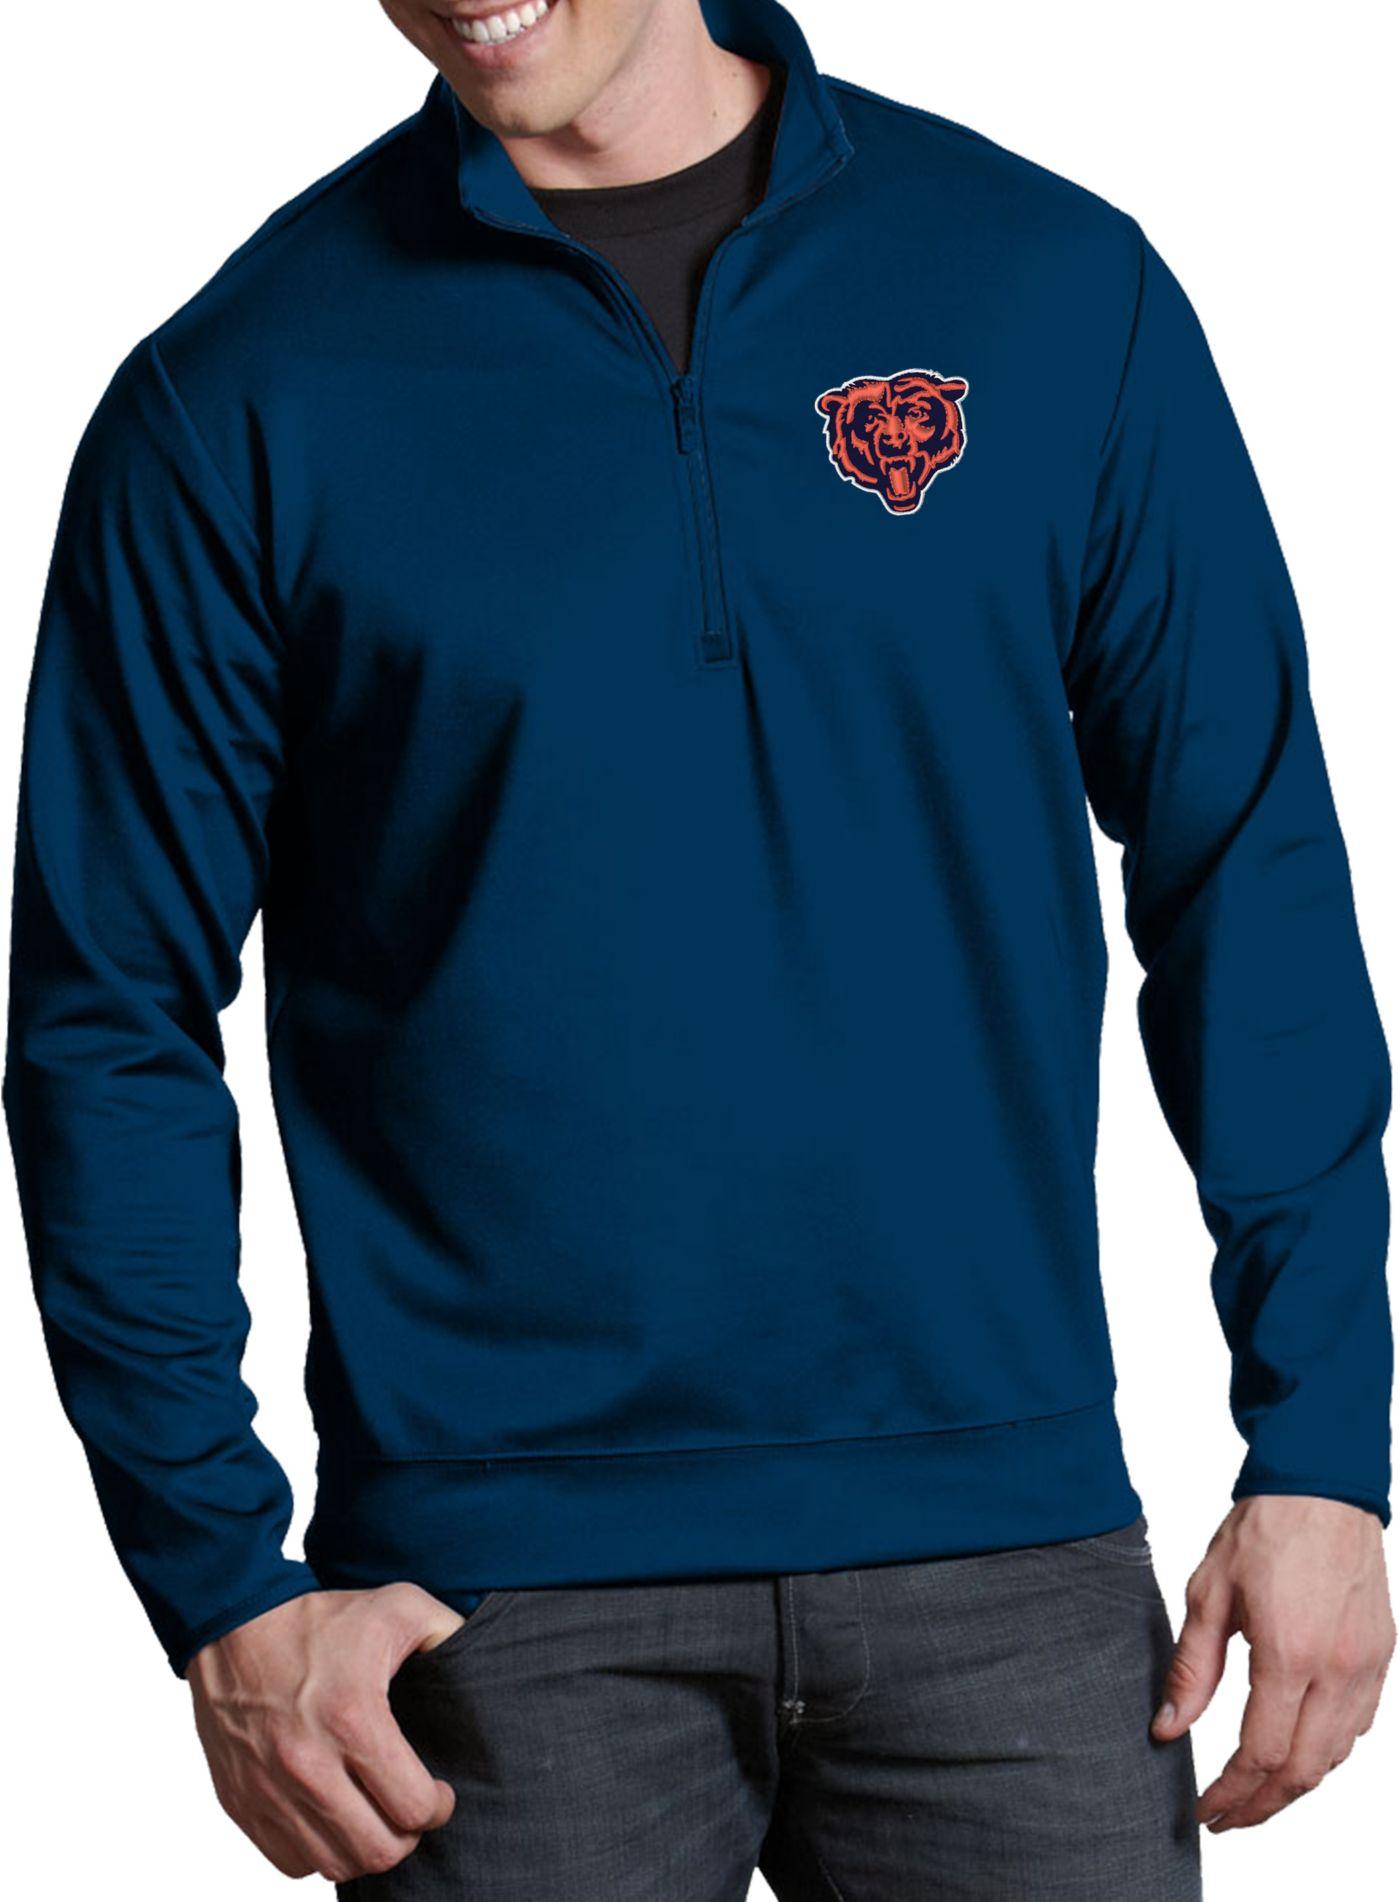 Antigua Men's Chicago Bears Leader Quarter-Zip Navy Pullover Top